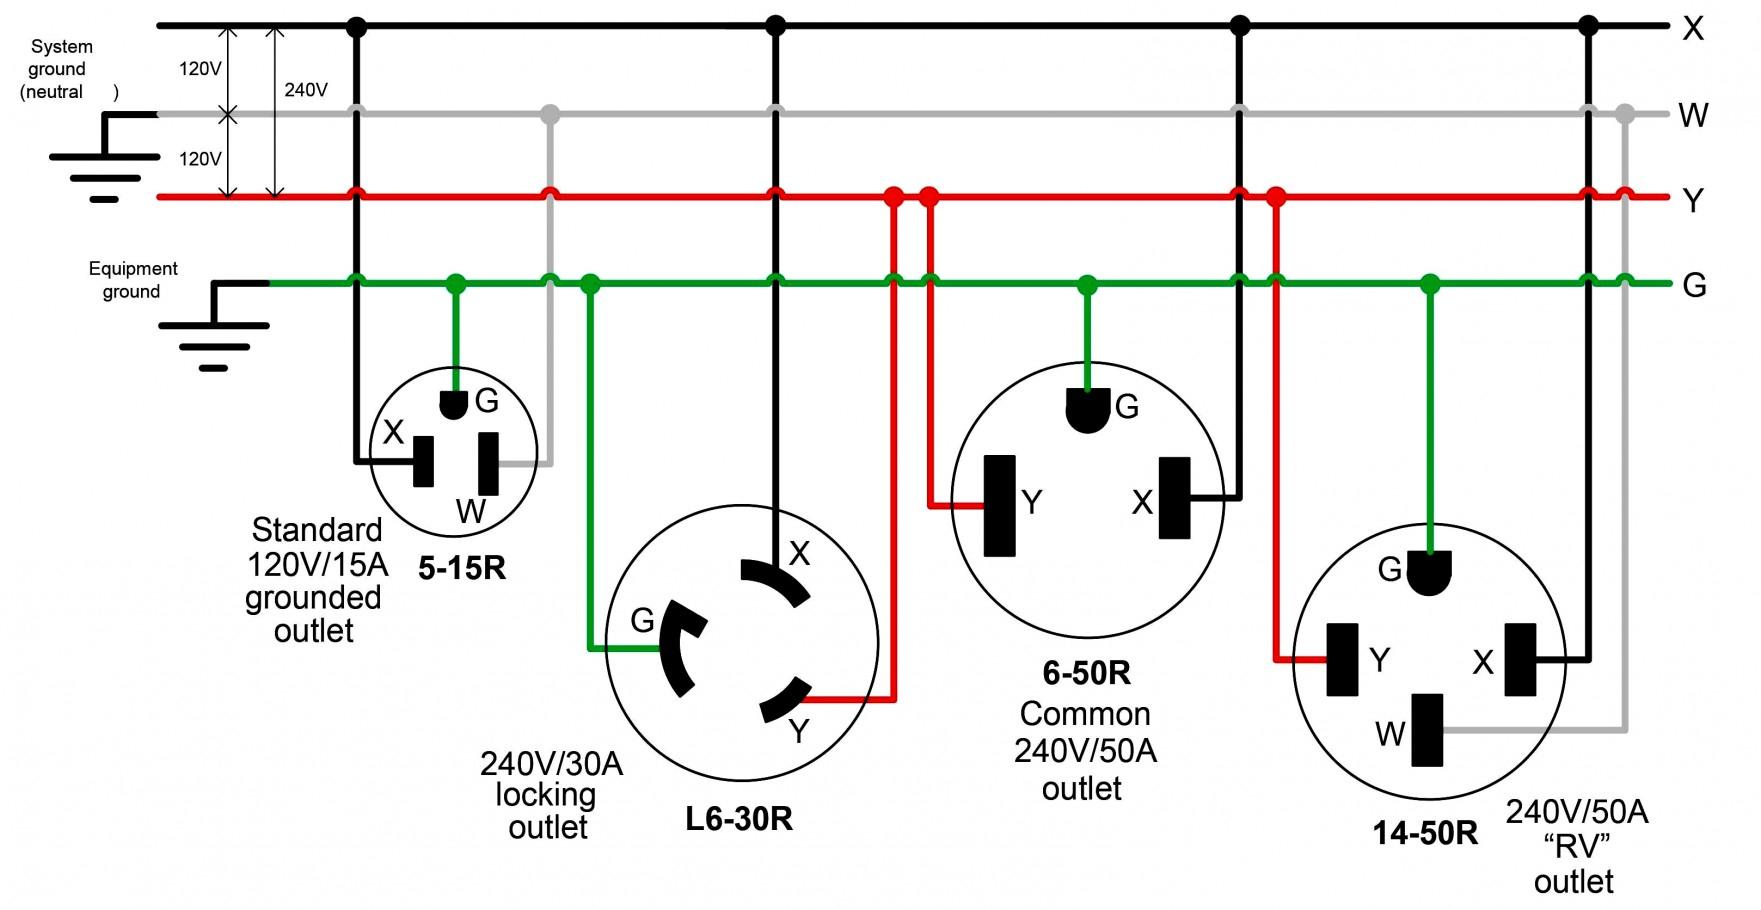 Wiring Diagram 120V - Wiring Diagram Data - 240V Water Heater Wiring Diagram